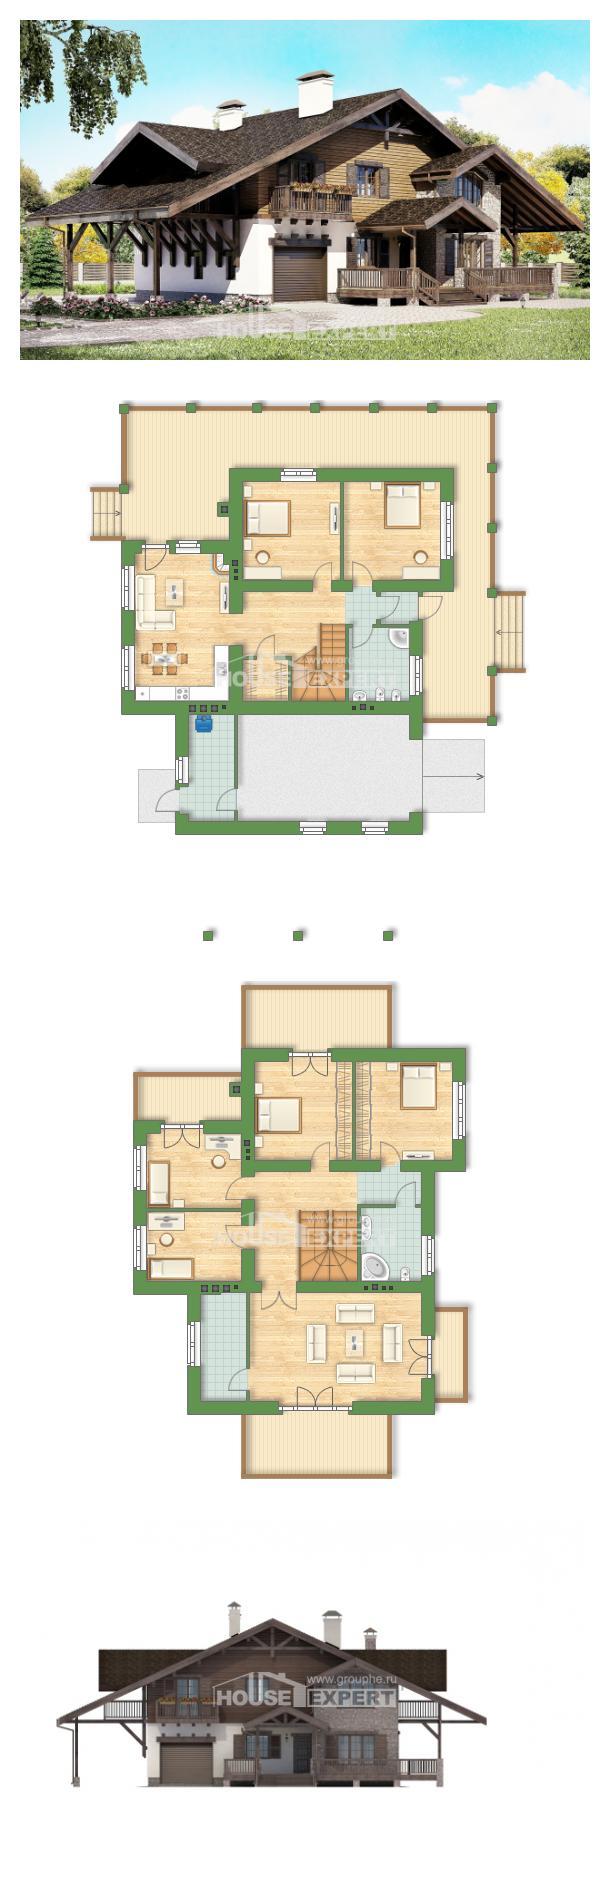 Proyecto de casa 270-001-L | House Expert